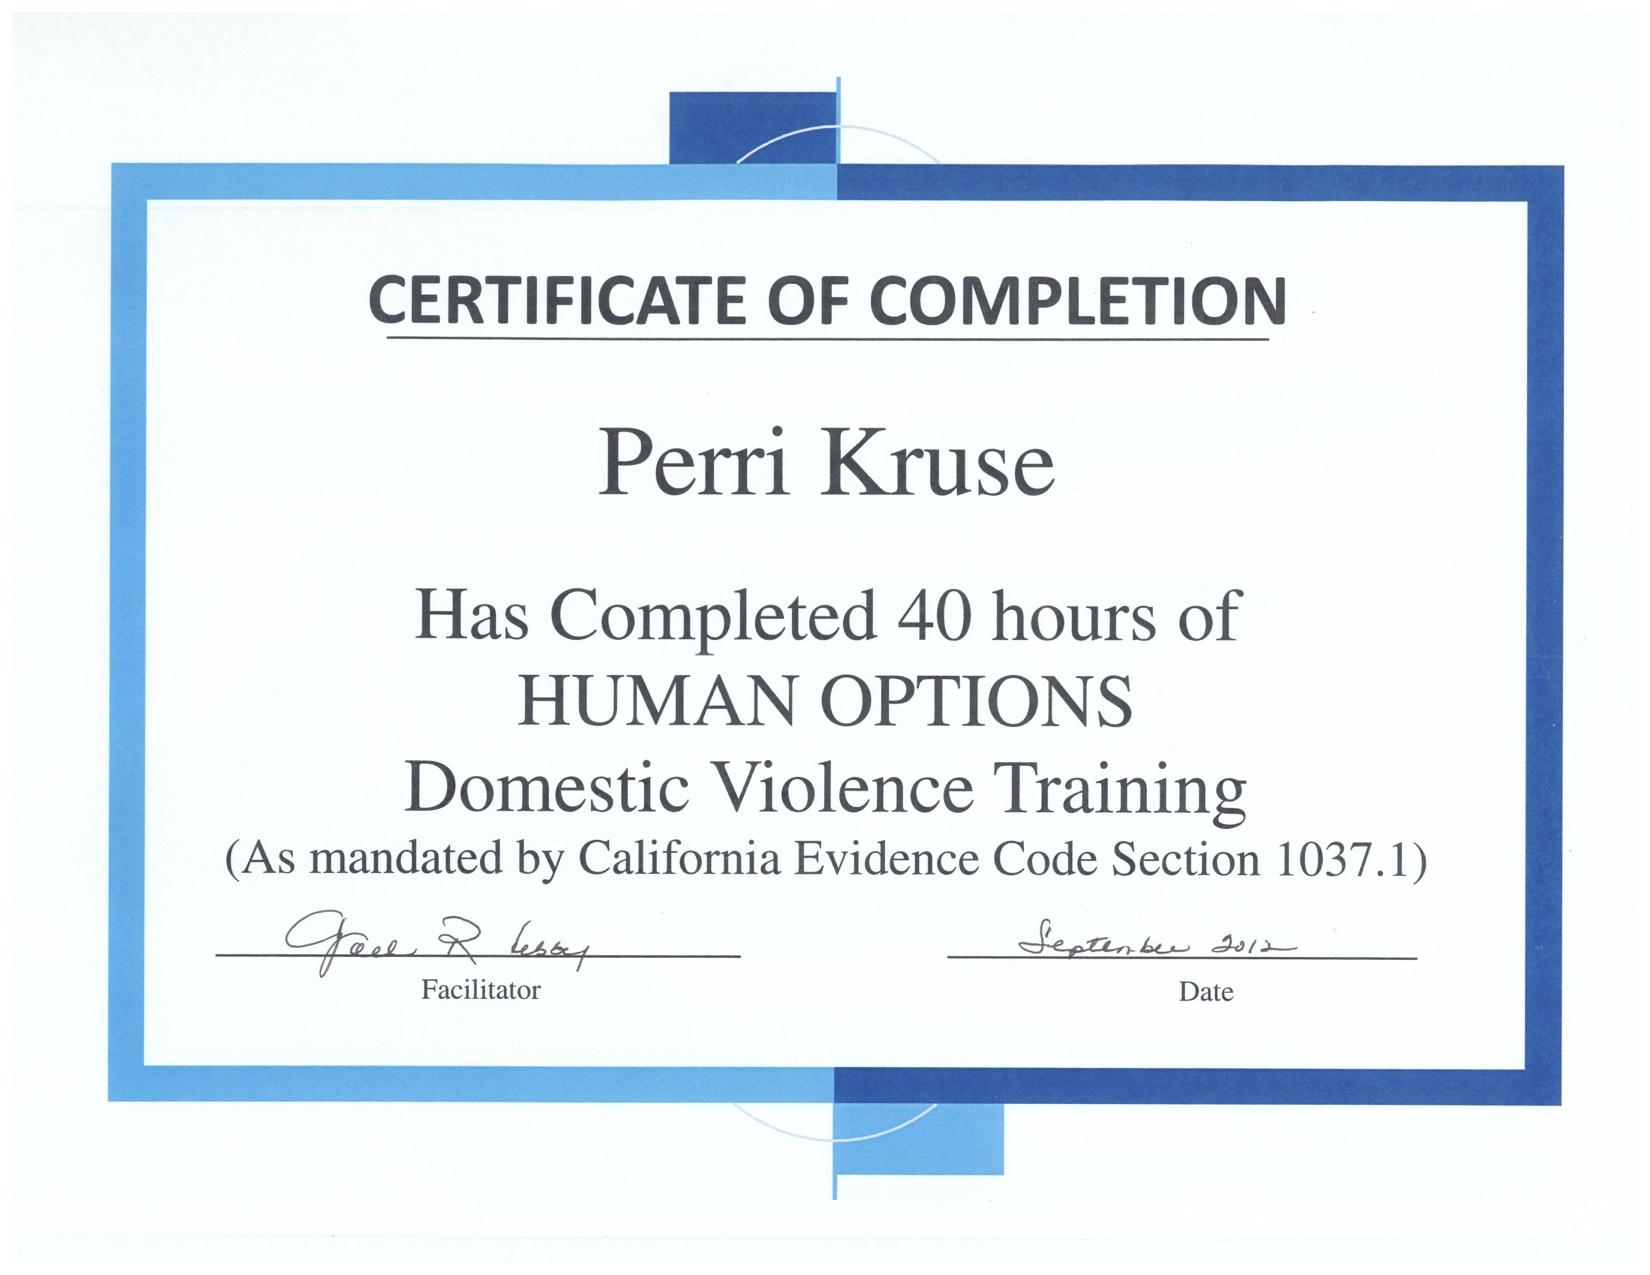 Perri Kruse, Certifications, MSW, LGSW, ACSW, LAPD, UCLA, Child Welfare